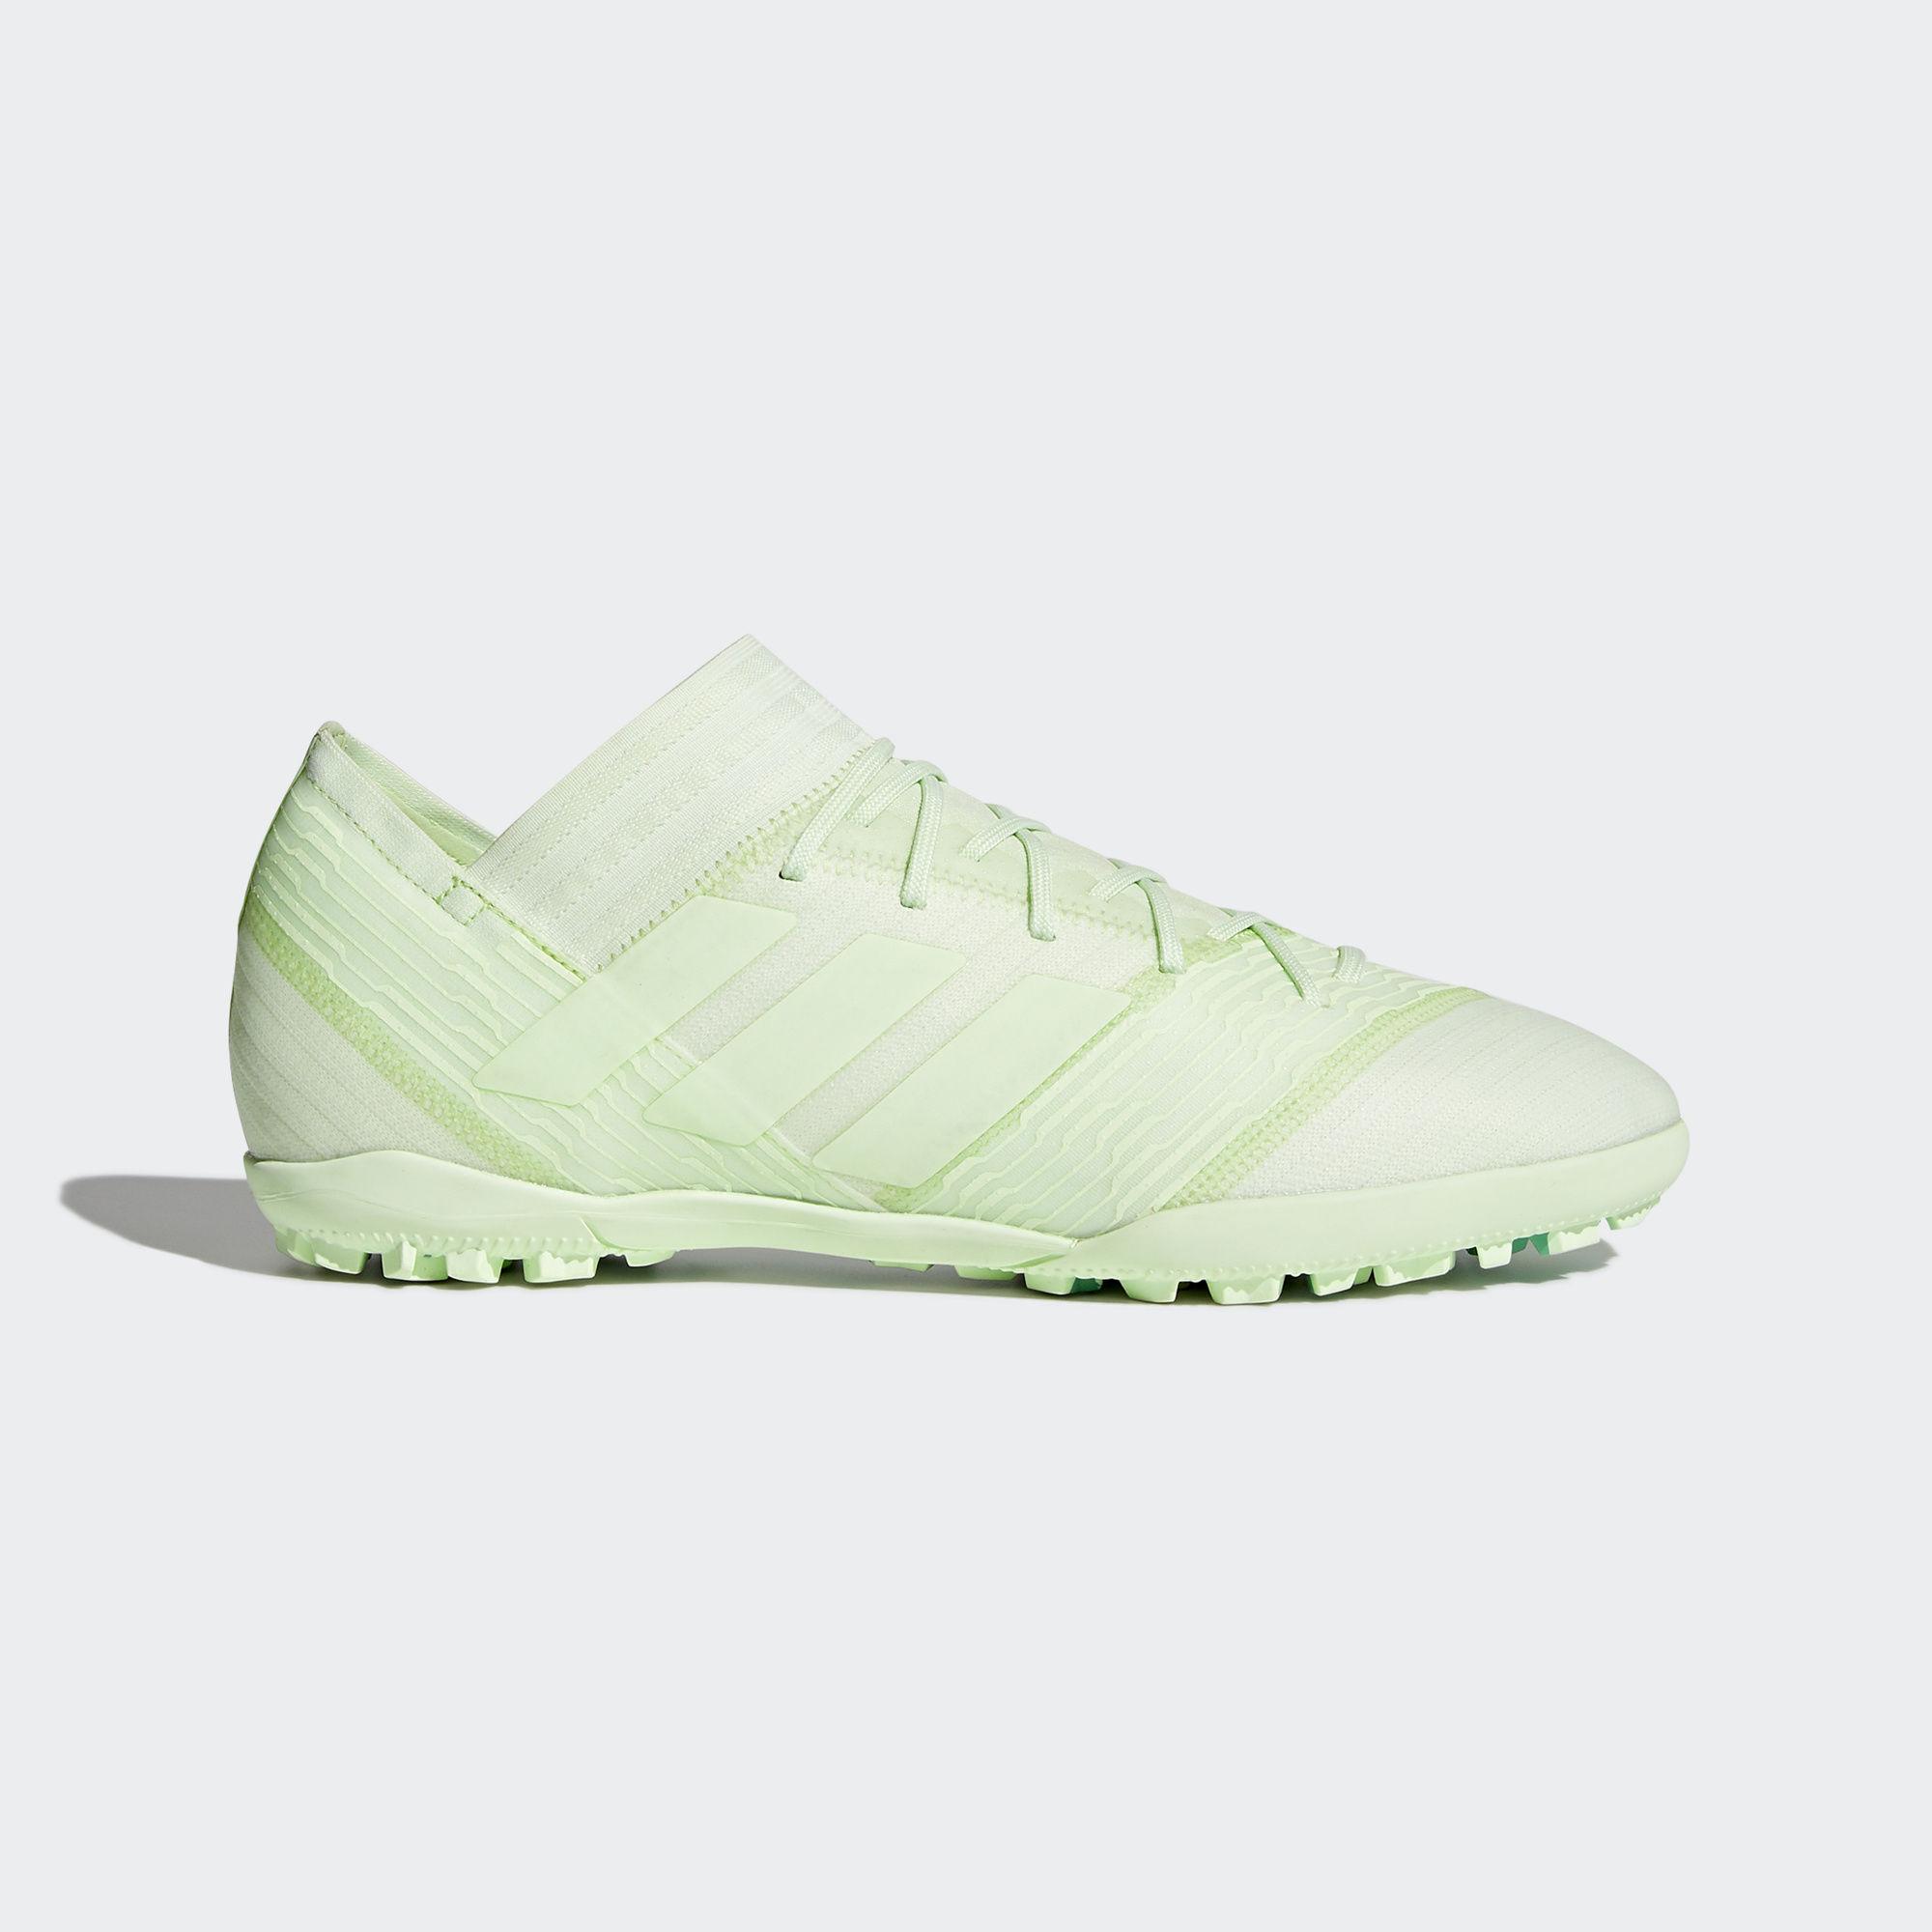 5cd70ff51 adidas nemeziz tango 17.3 in deadly strike aero green aero green hi  click  to enlarge image  adidasnemeziztango173tfdeadlystrikeaerogreenaerogreenhiresgreena